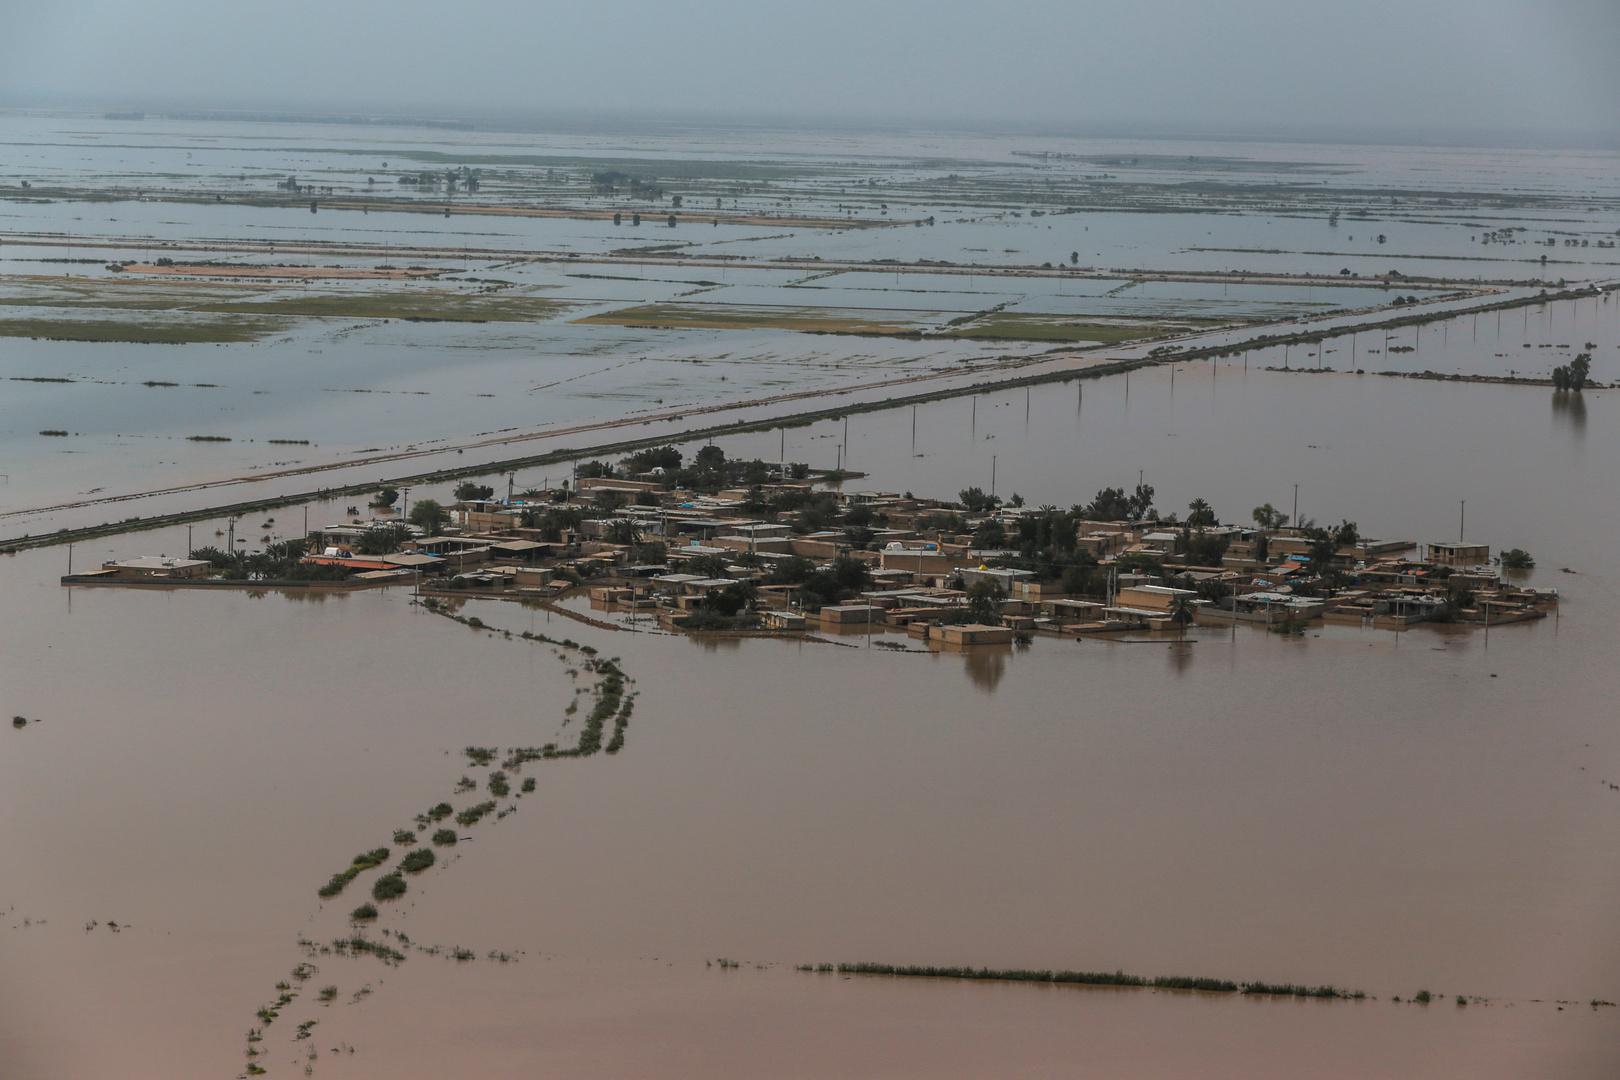 إيران.. 8 قتلى ومفقودان جراء الفيضانات